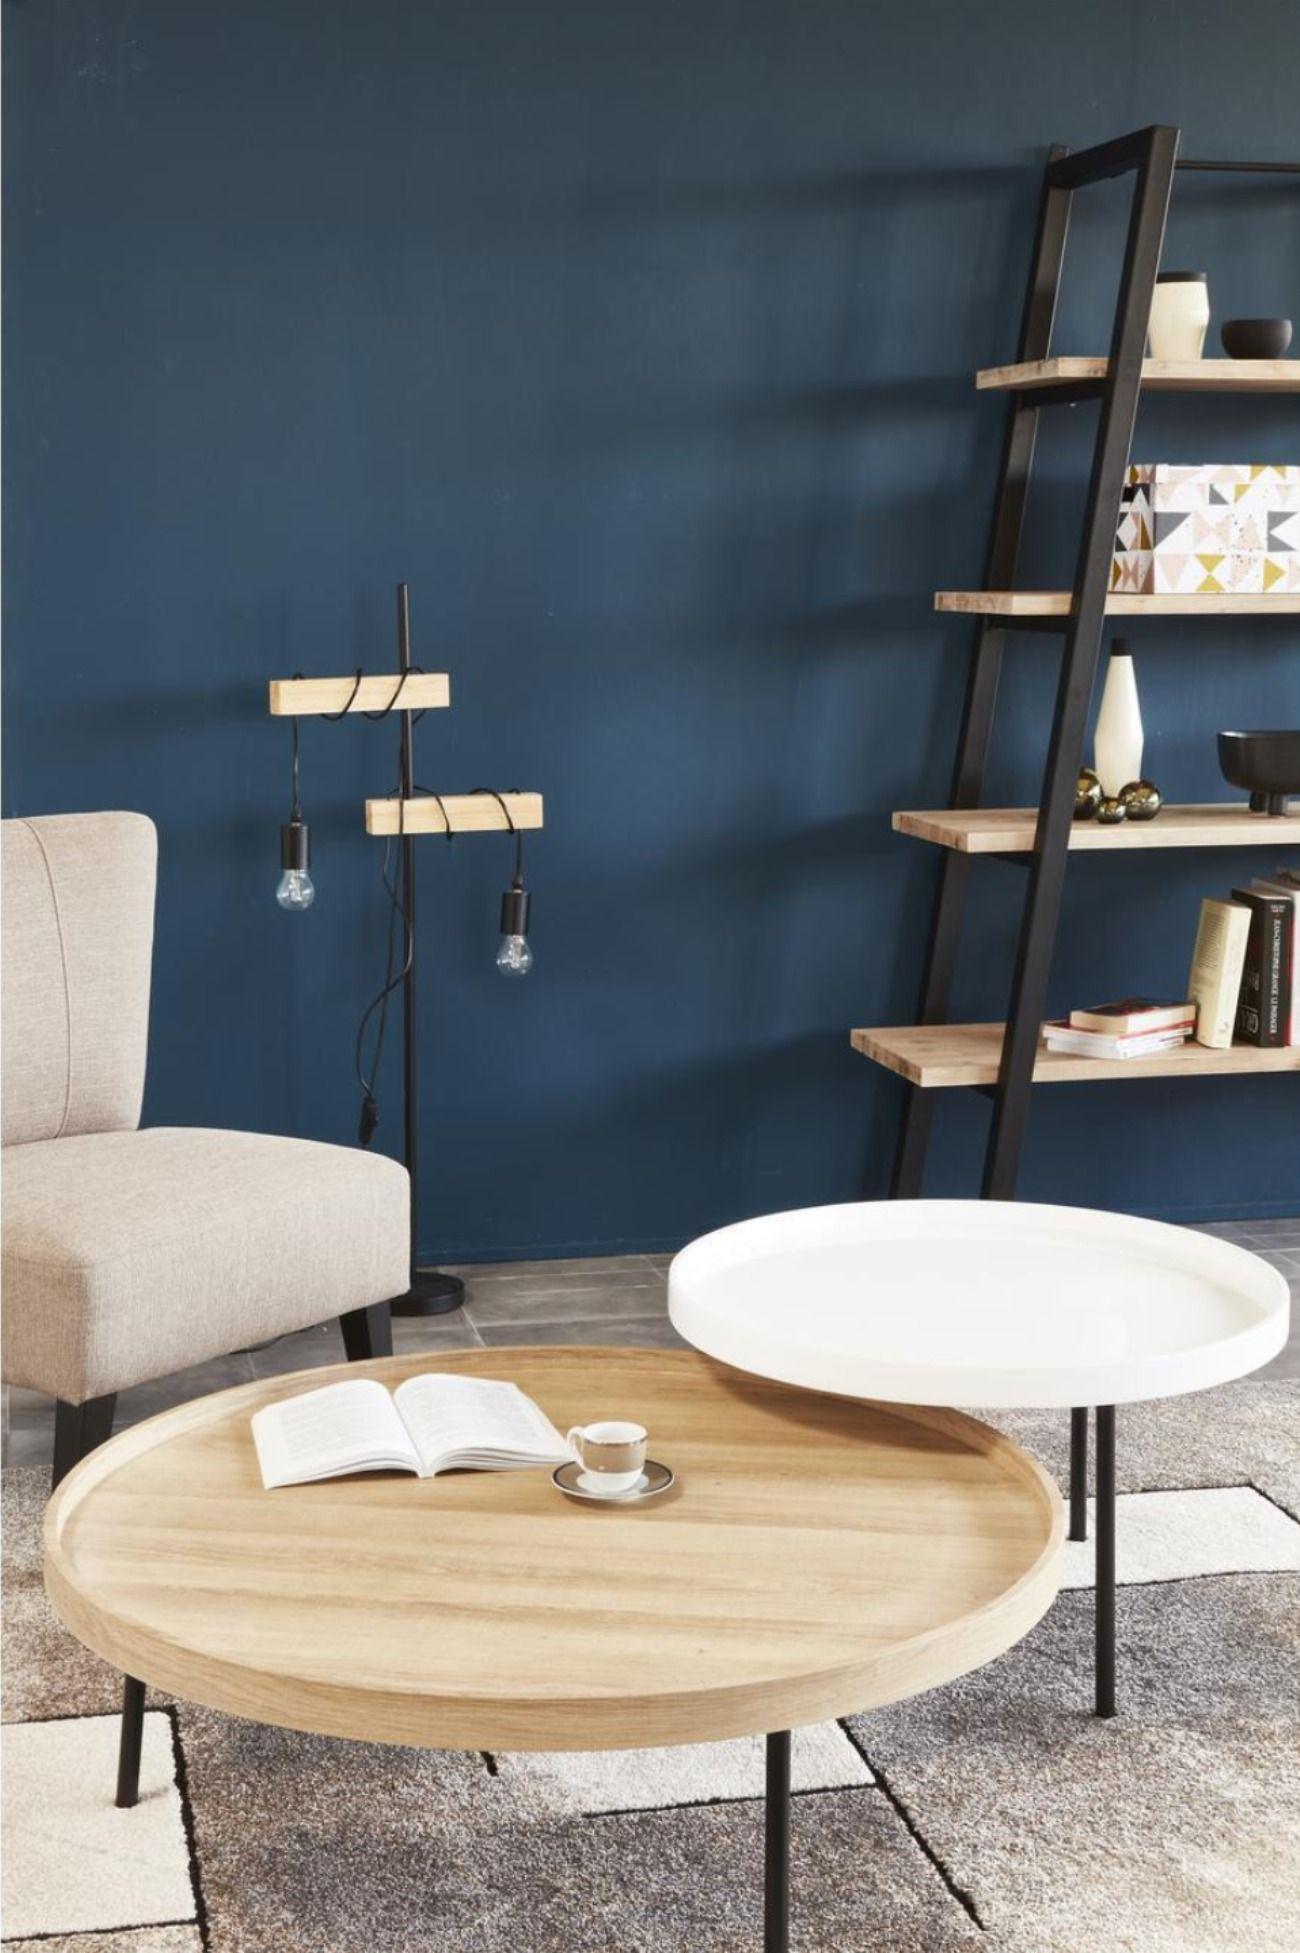 Table Aveiro Bois Beige Et Blanc Bobochic En 2020 Table Basse Deco Mur Salon Table Basse Salon